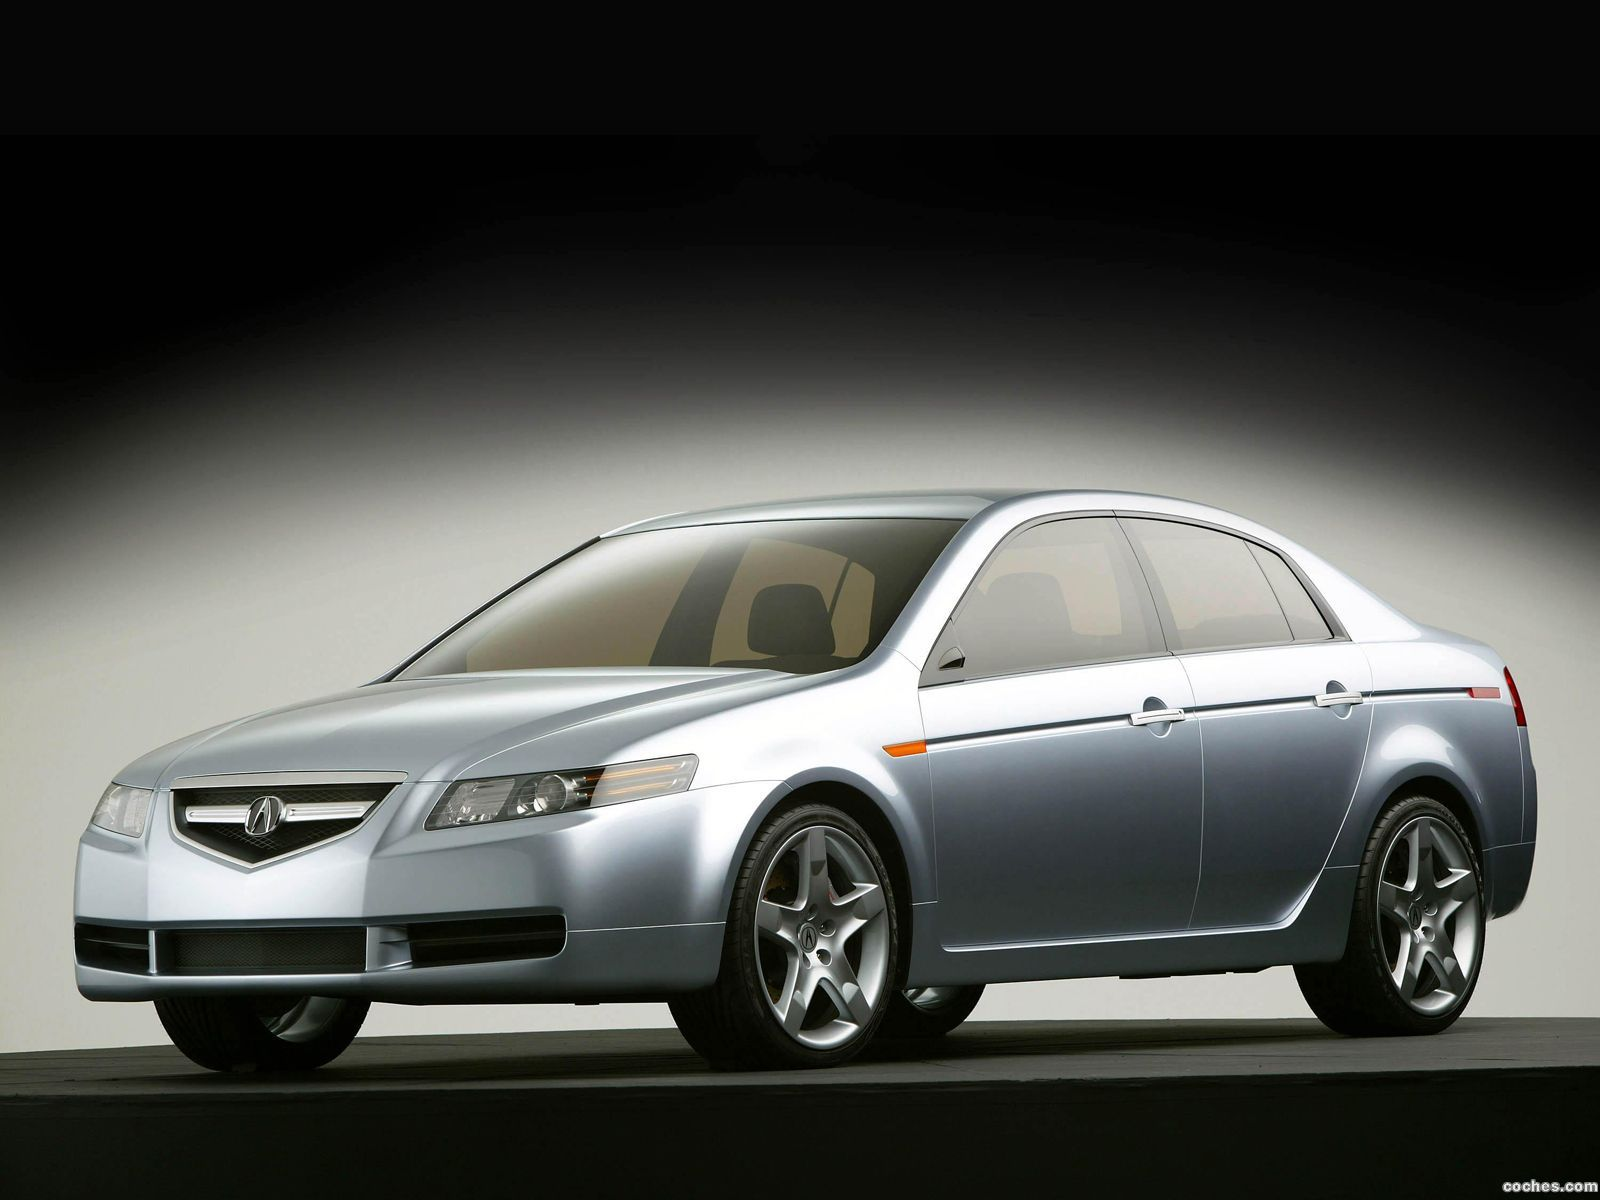 Foto 0 de Acura TL Concept 2003